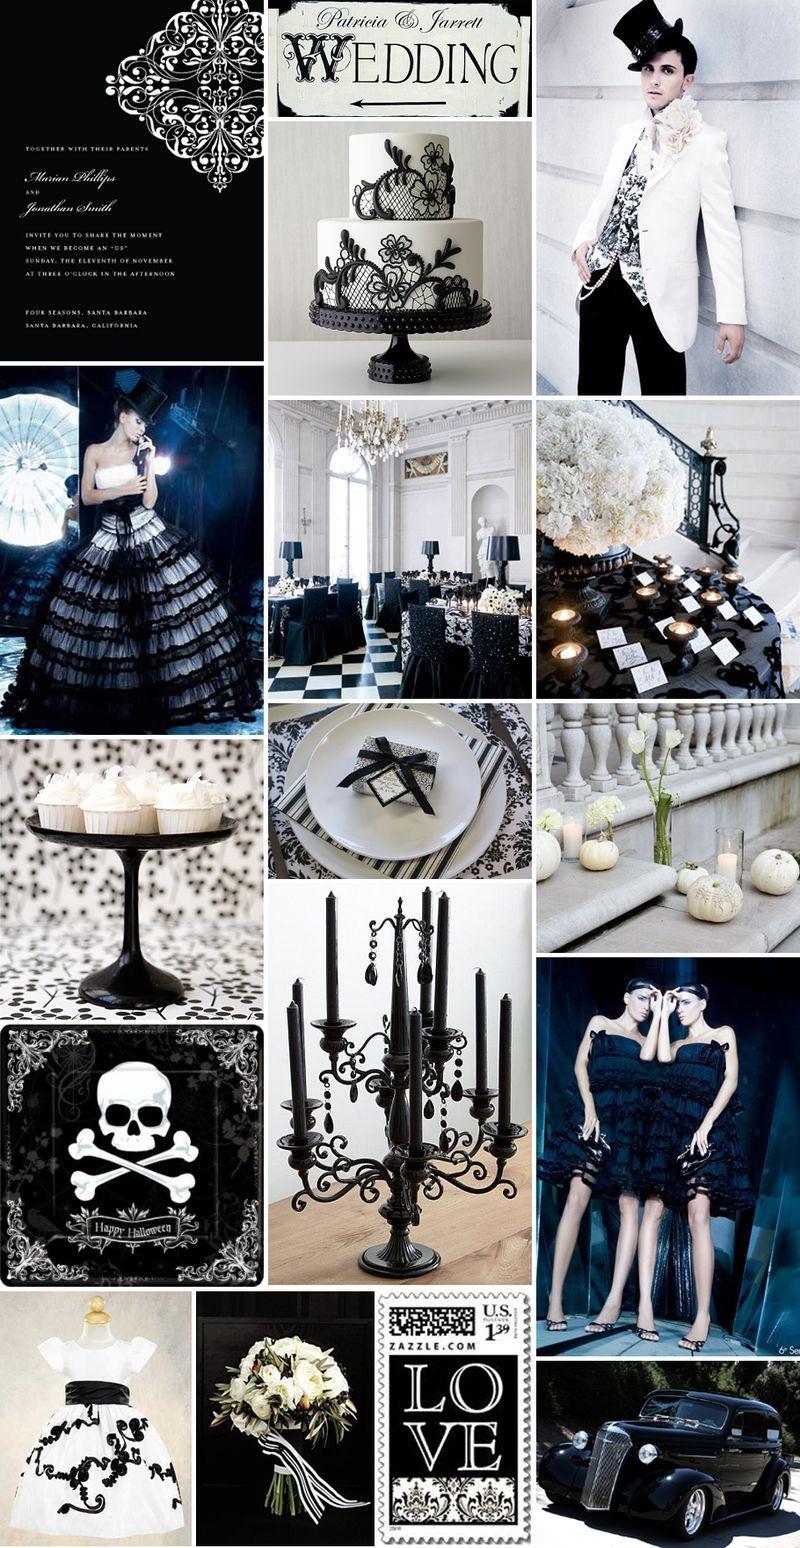 Halloween wedding gothic glam black and white theme